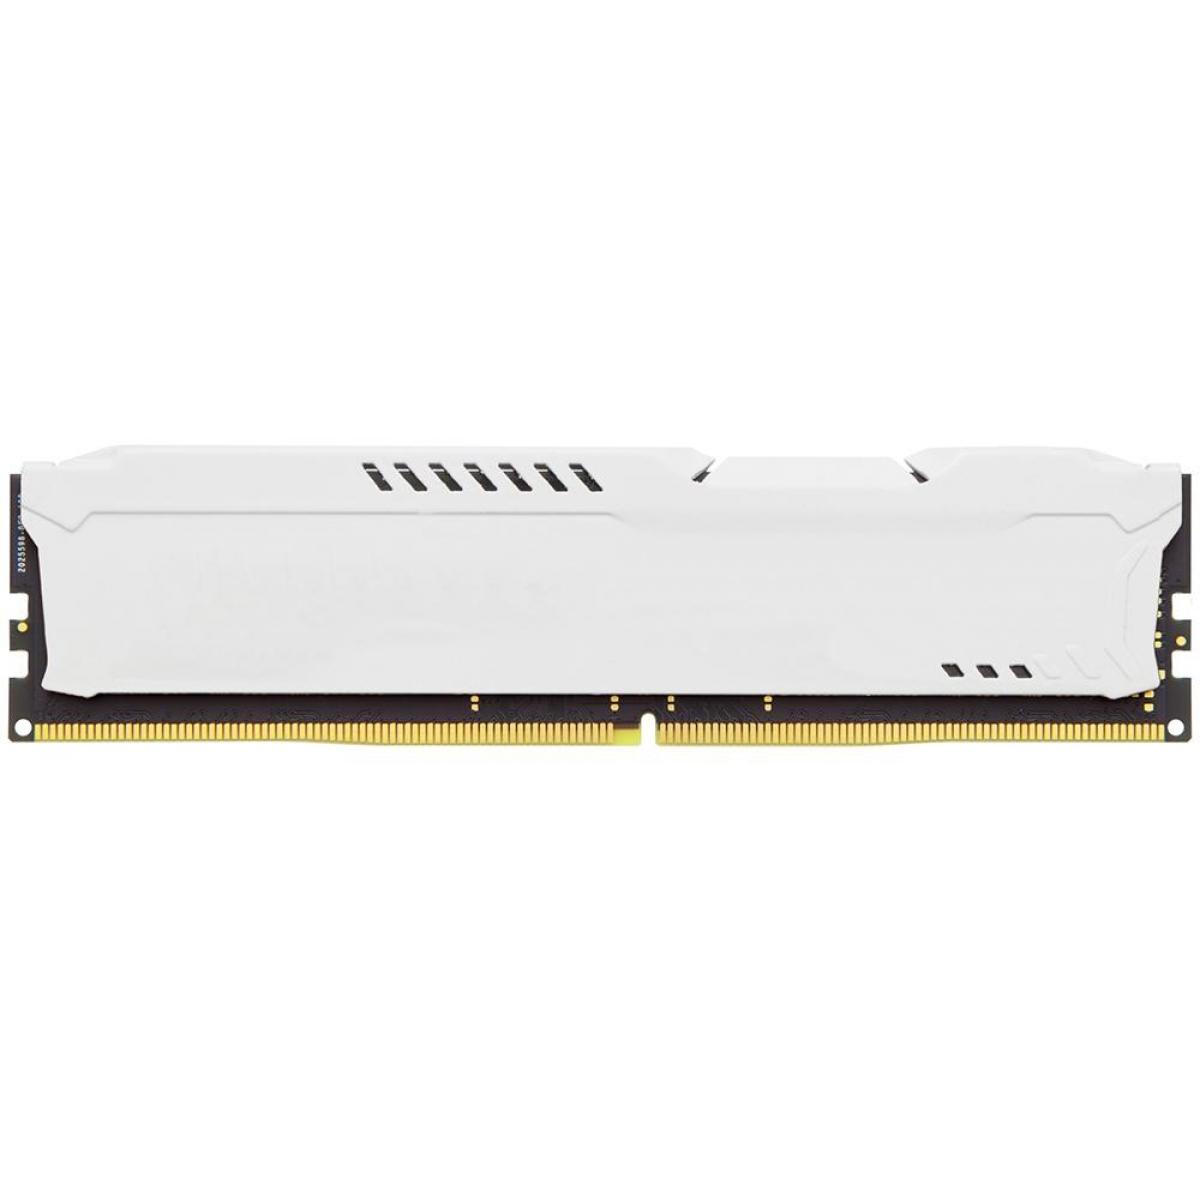 Memória DDR4 Kingston HyperX Fury, 8GB 3200MHz, White, HX432C18FW2/8